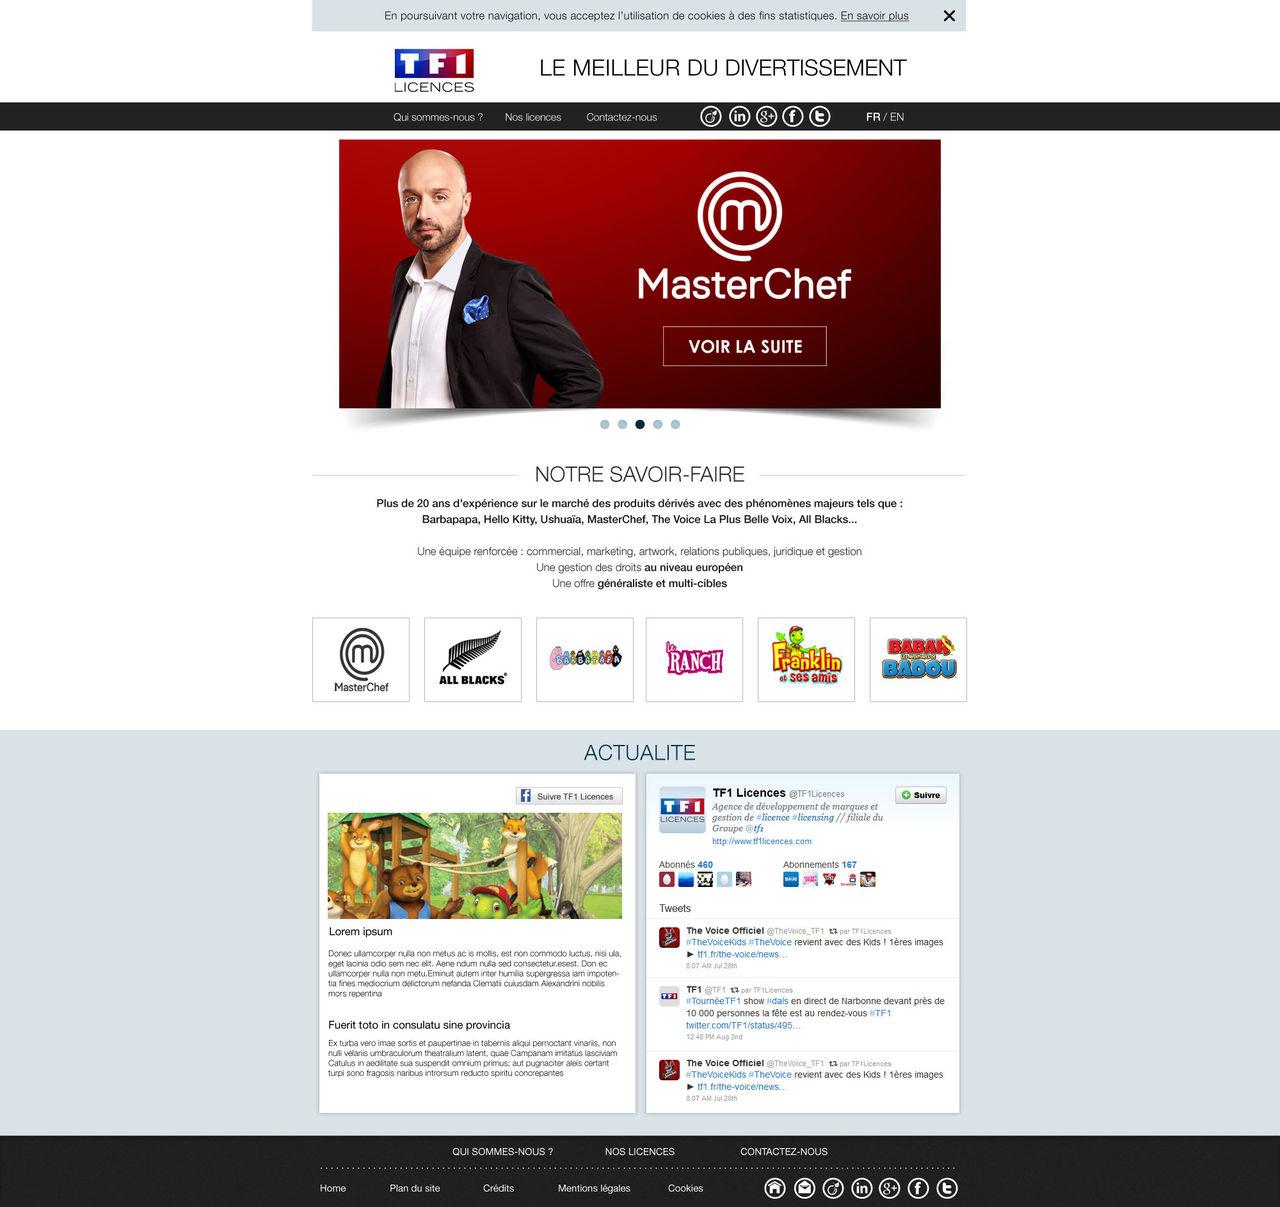 TF1 Licences